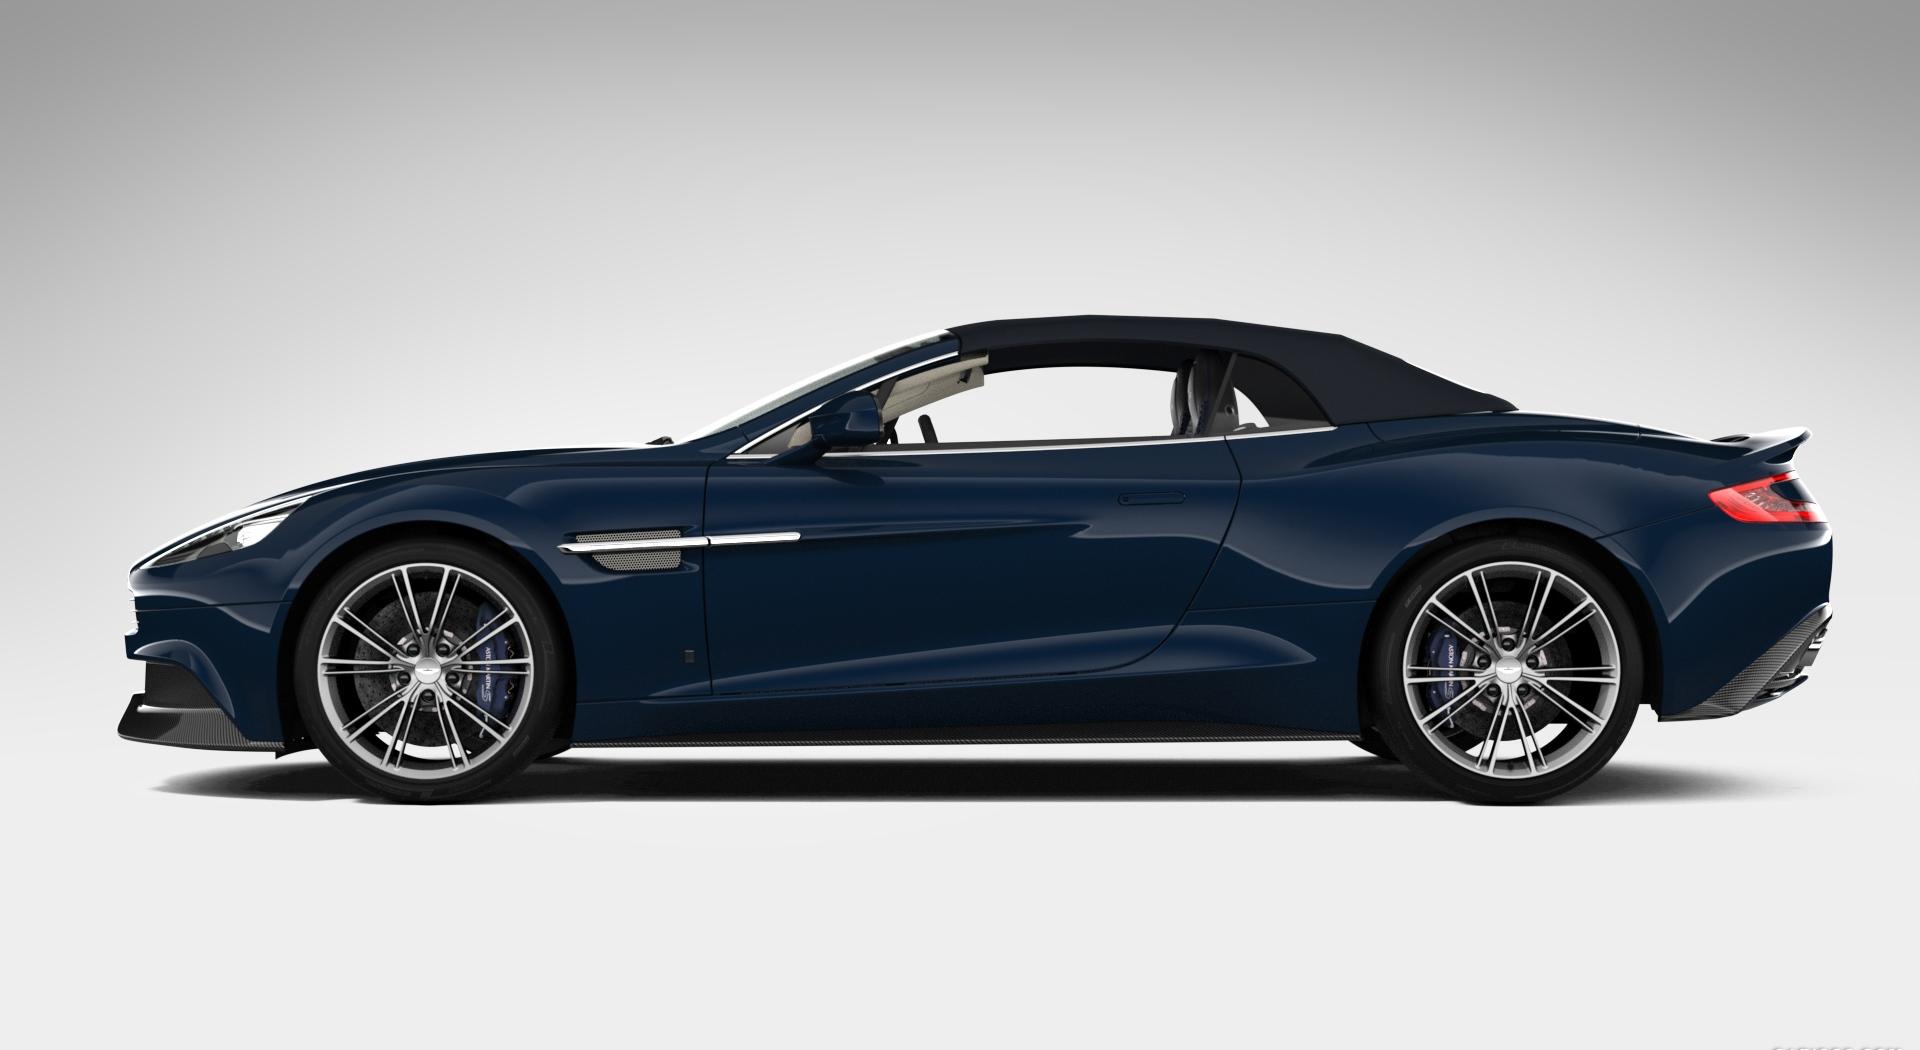 Aston Martin Vanquish Wallpapers volante